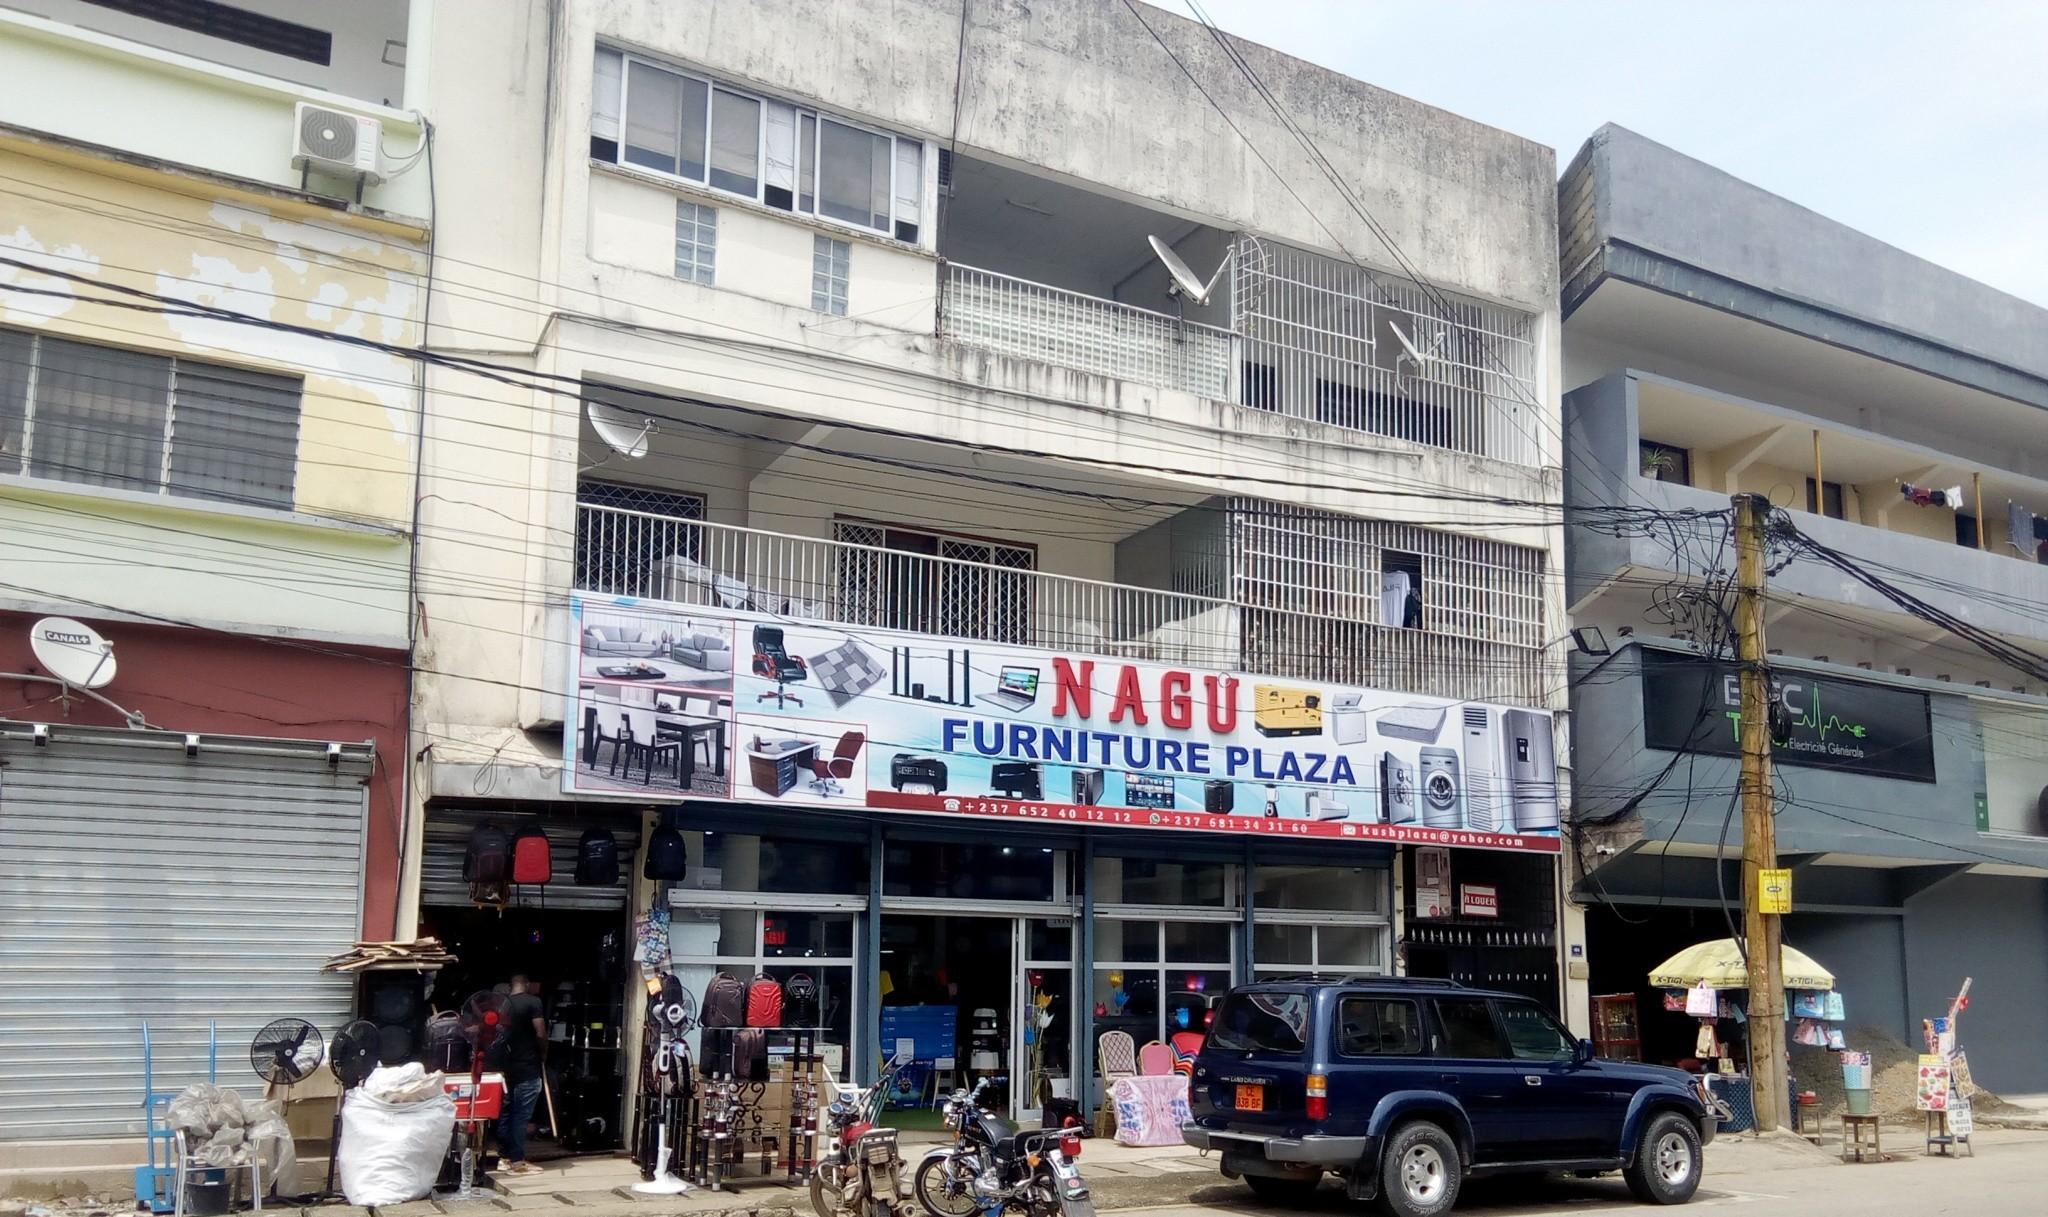 NAGU FURNITURE PLAZA Akwa Douala Cameroun – NNG01